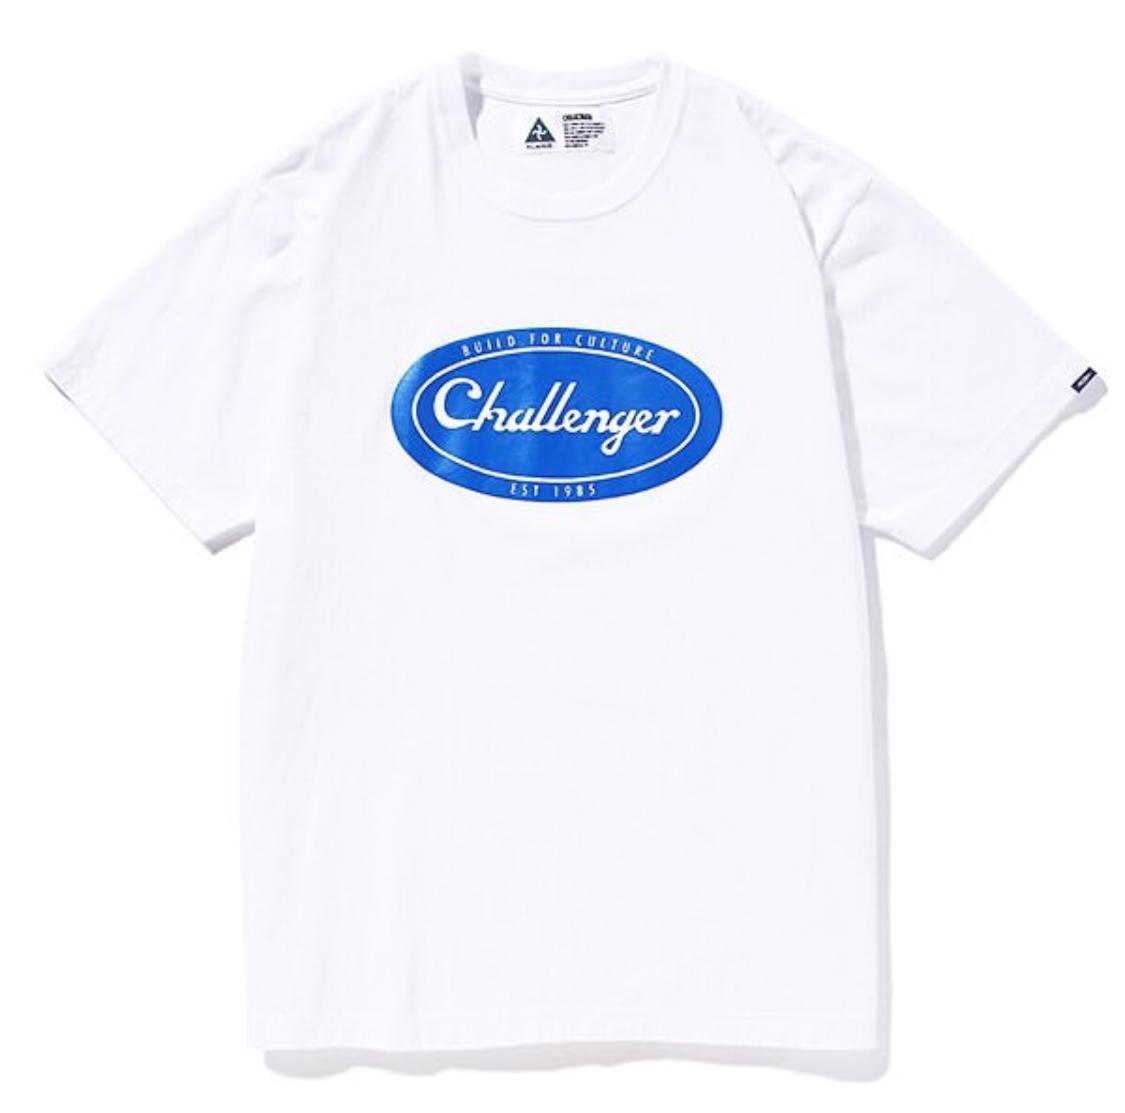 CHALLENGER NEW ITEMS!!!!_d0101000_11335676.jpg